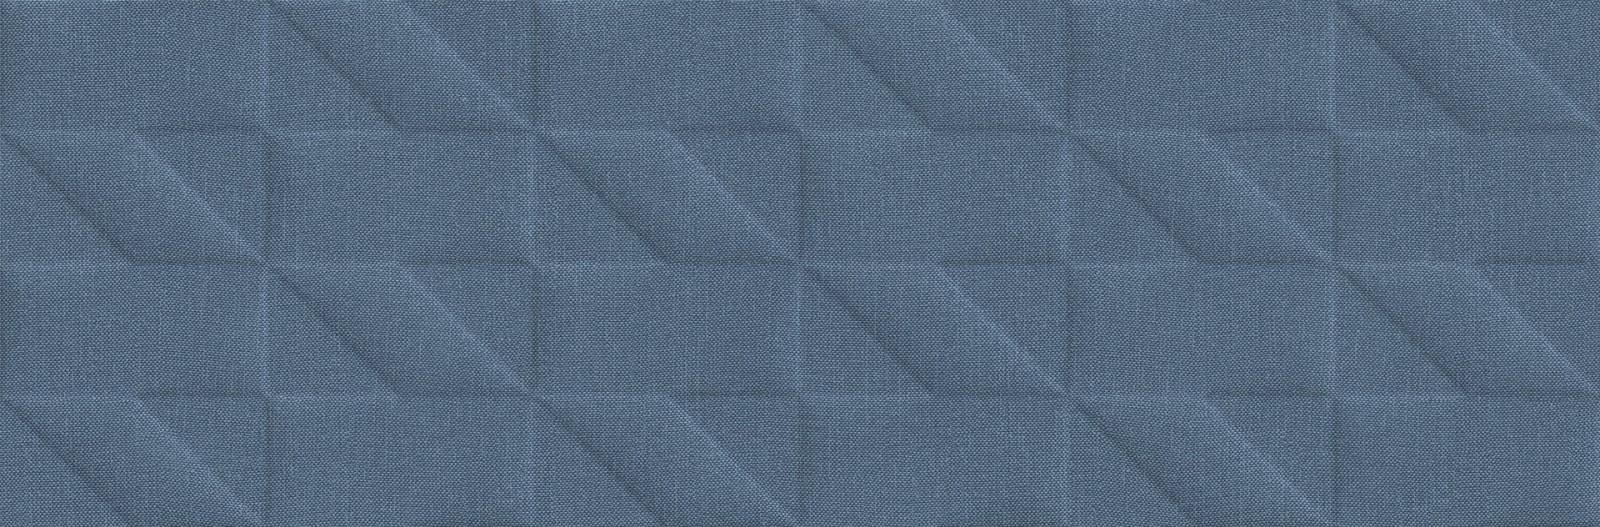 Стенни плочки Outfit Blue Struttura Tetris 3D 25x76